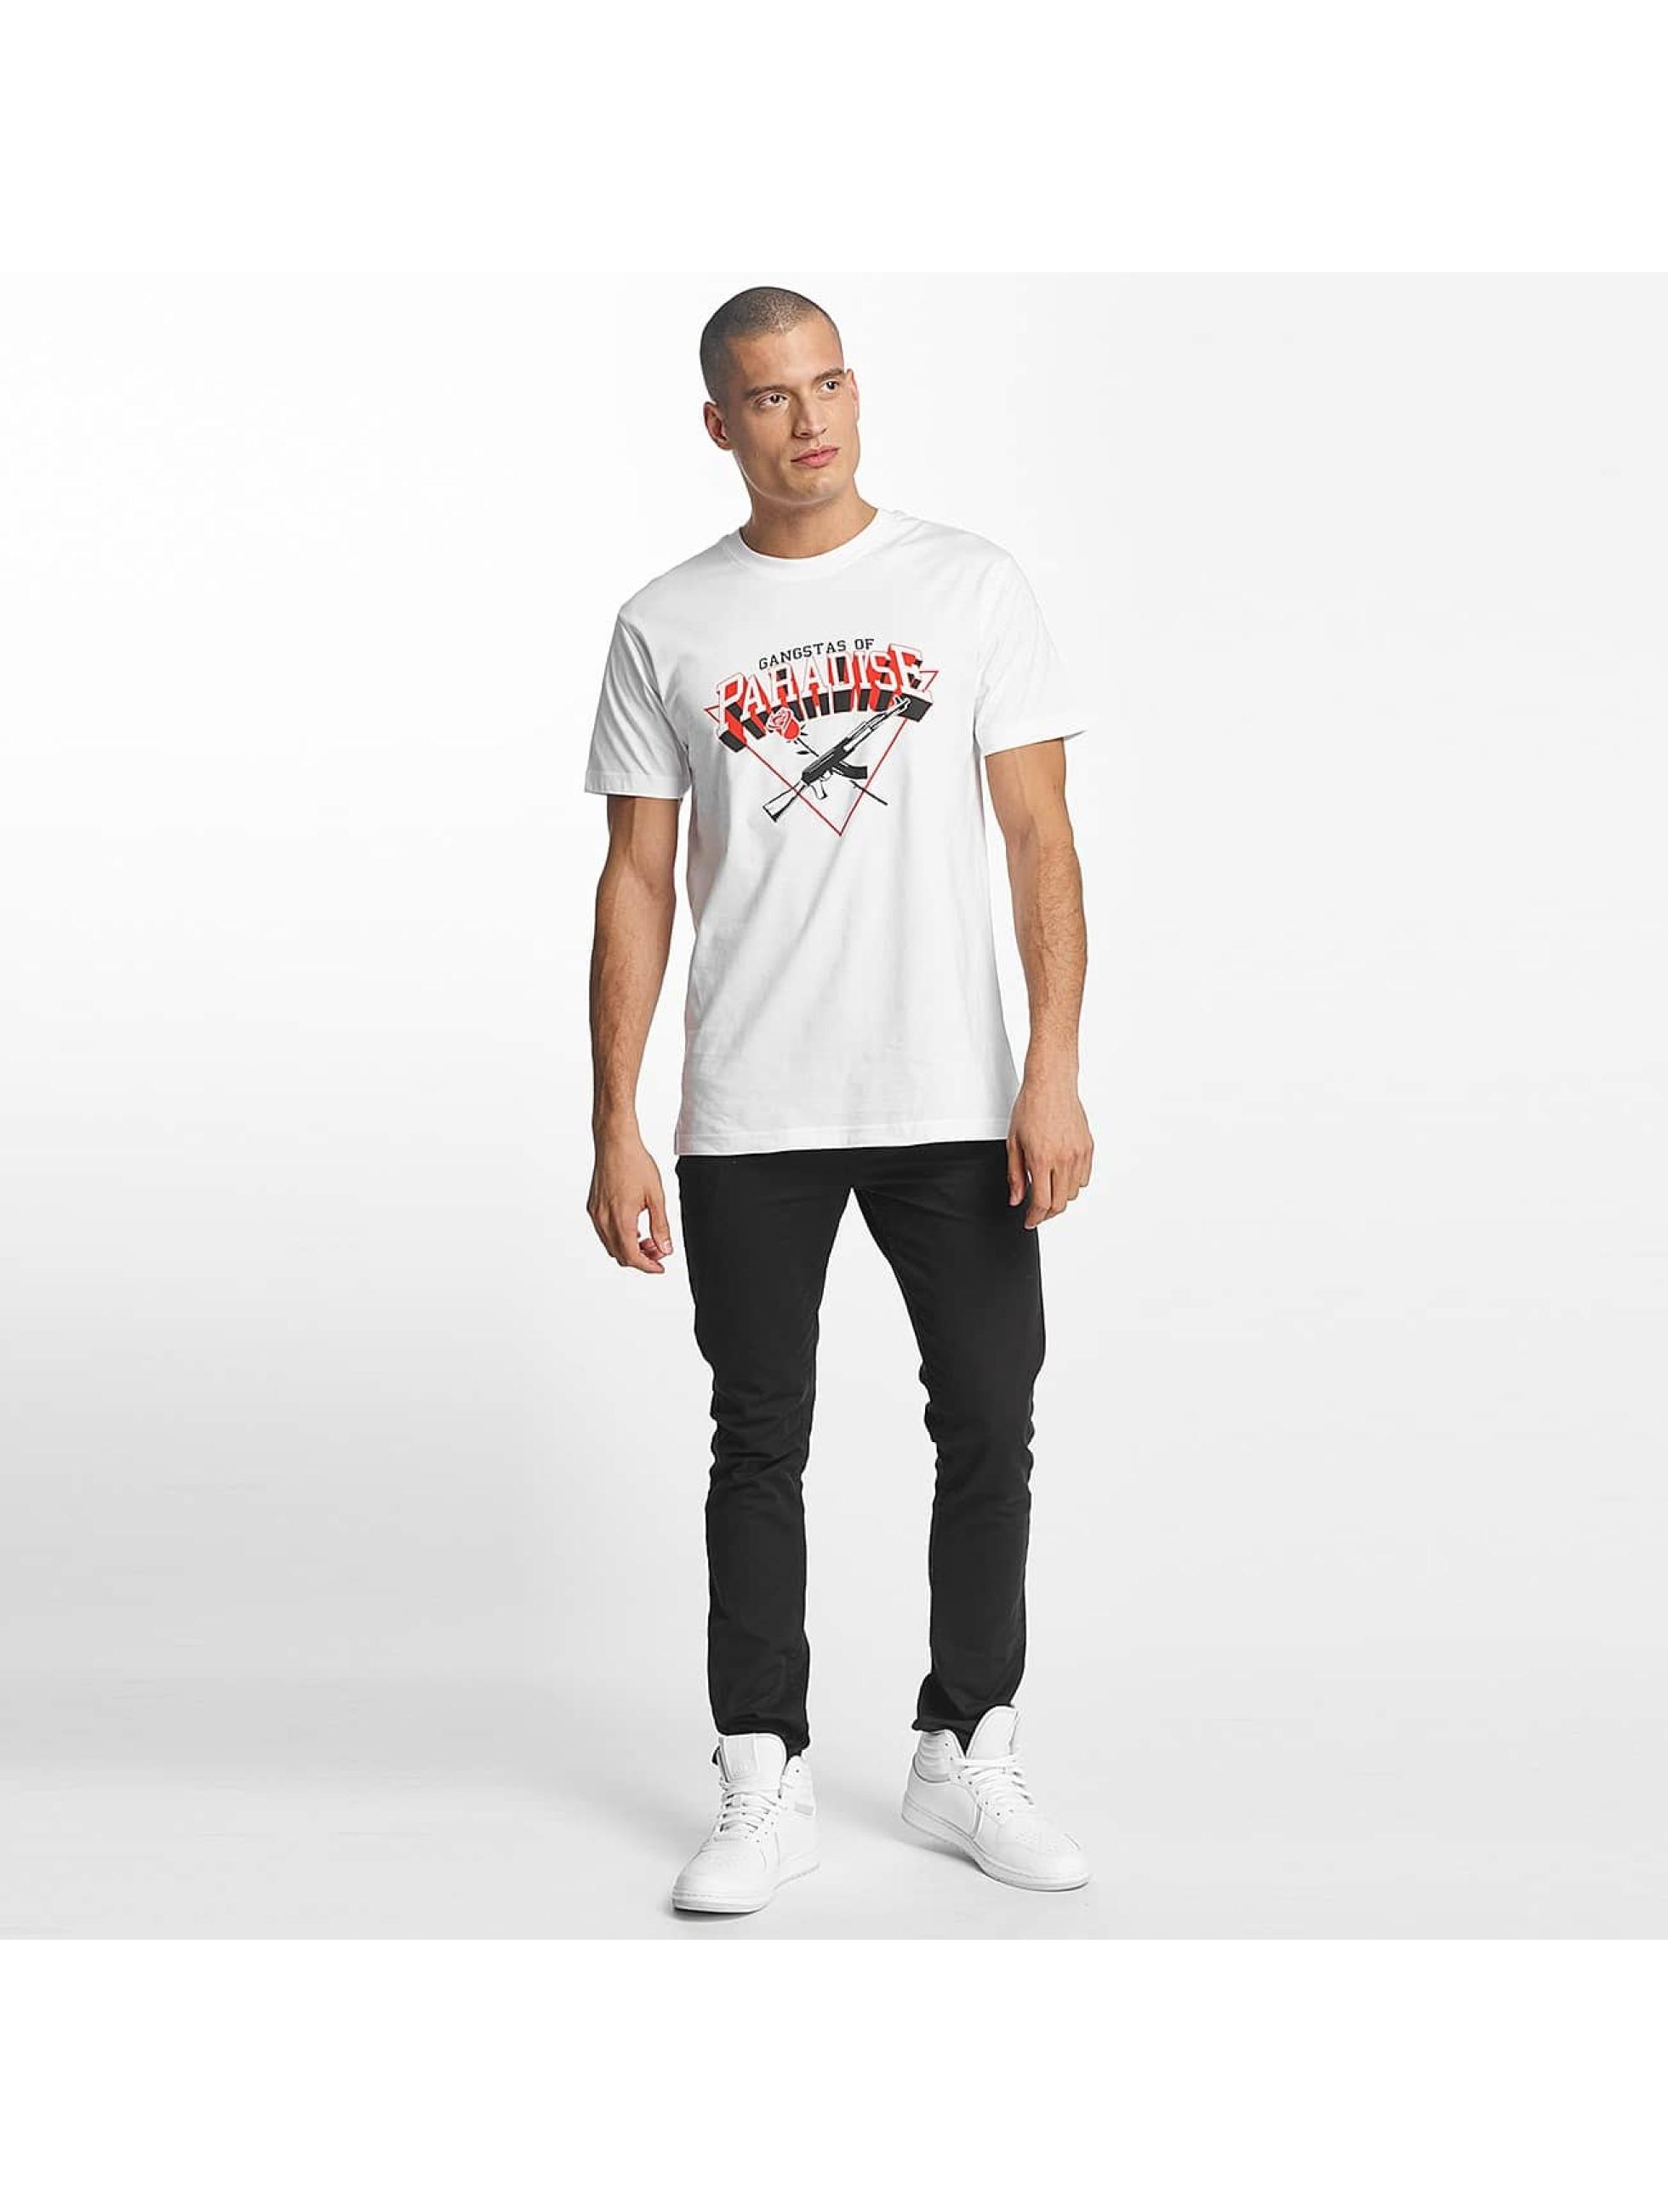 Mister Tee T-Shirt Gangstas of Paradise weiß